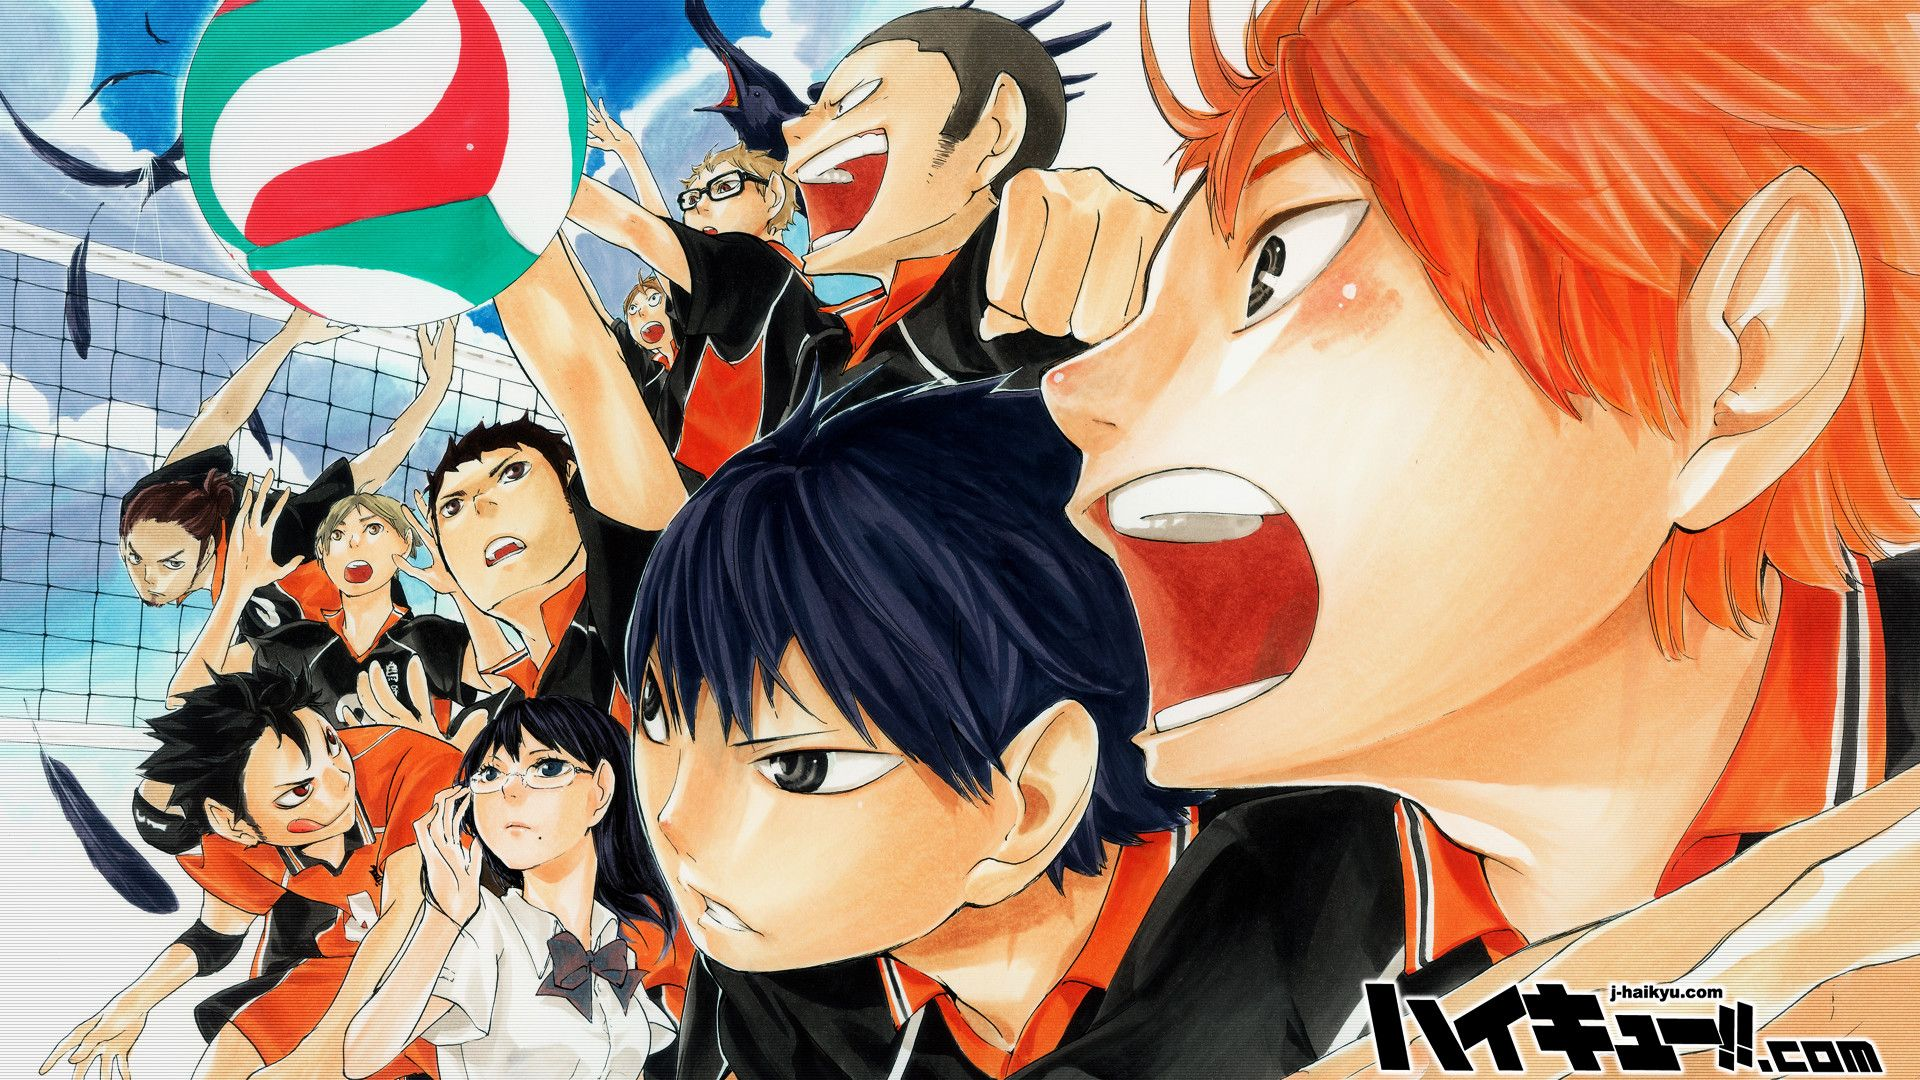 1920x1080 Karasuno High Volleyball Team Haikyuu Anime Haikyuu Anime Anime Haikyuu